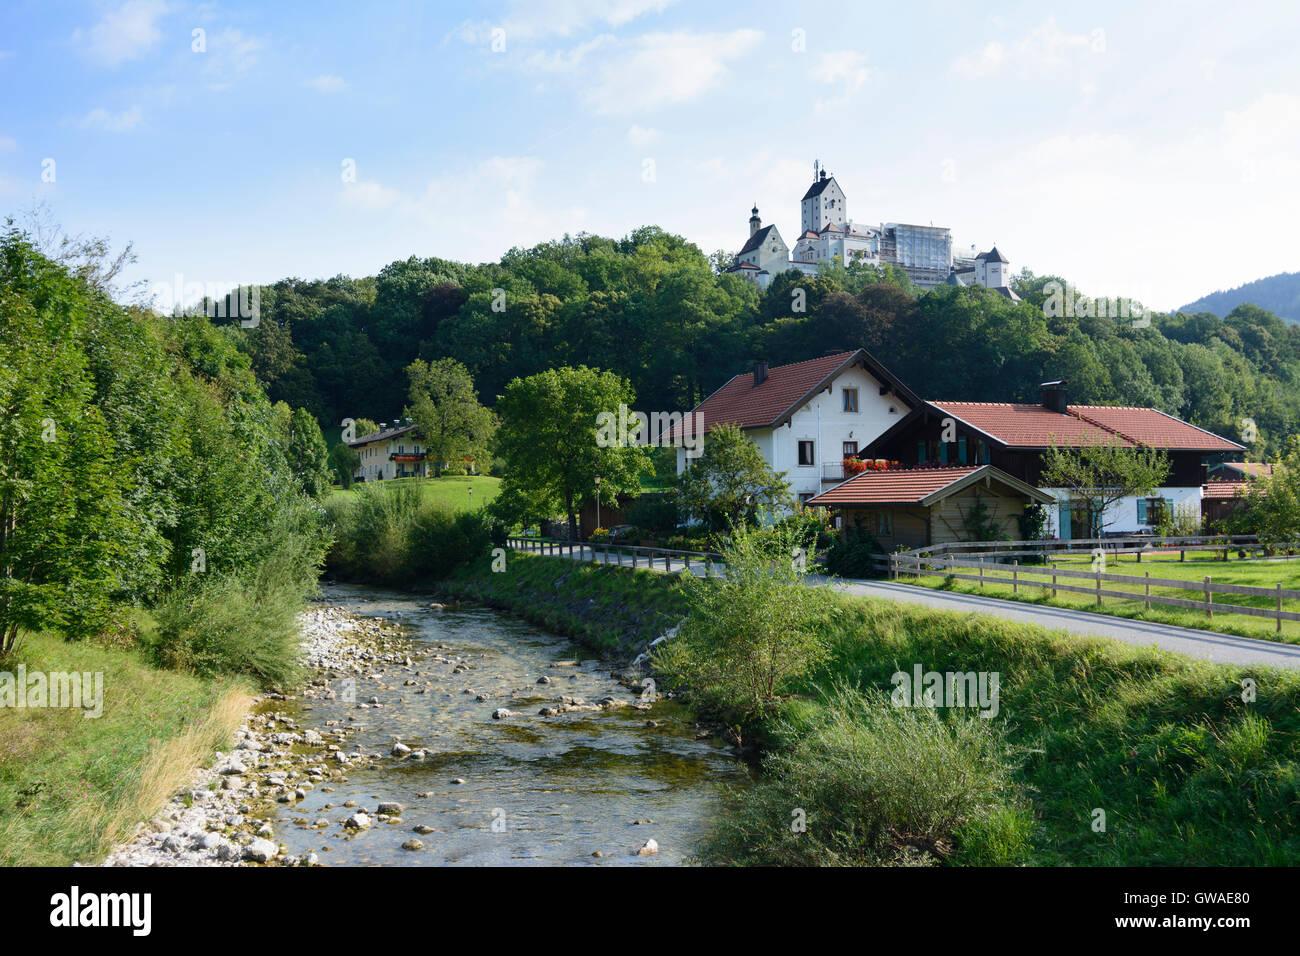 Aschau im Chiemgau: Hohenaschau Castle, river Prien, Germany, Bayern, Bavaria, Oberbayern, Chiemgau, Upper Bavaria Stock Photo